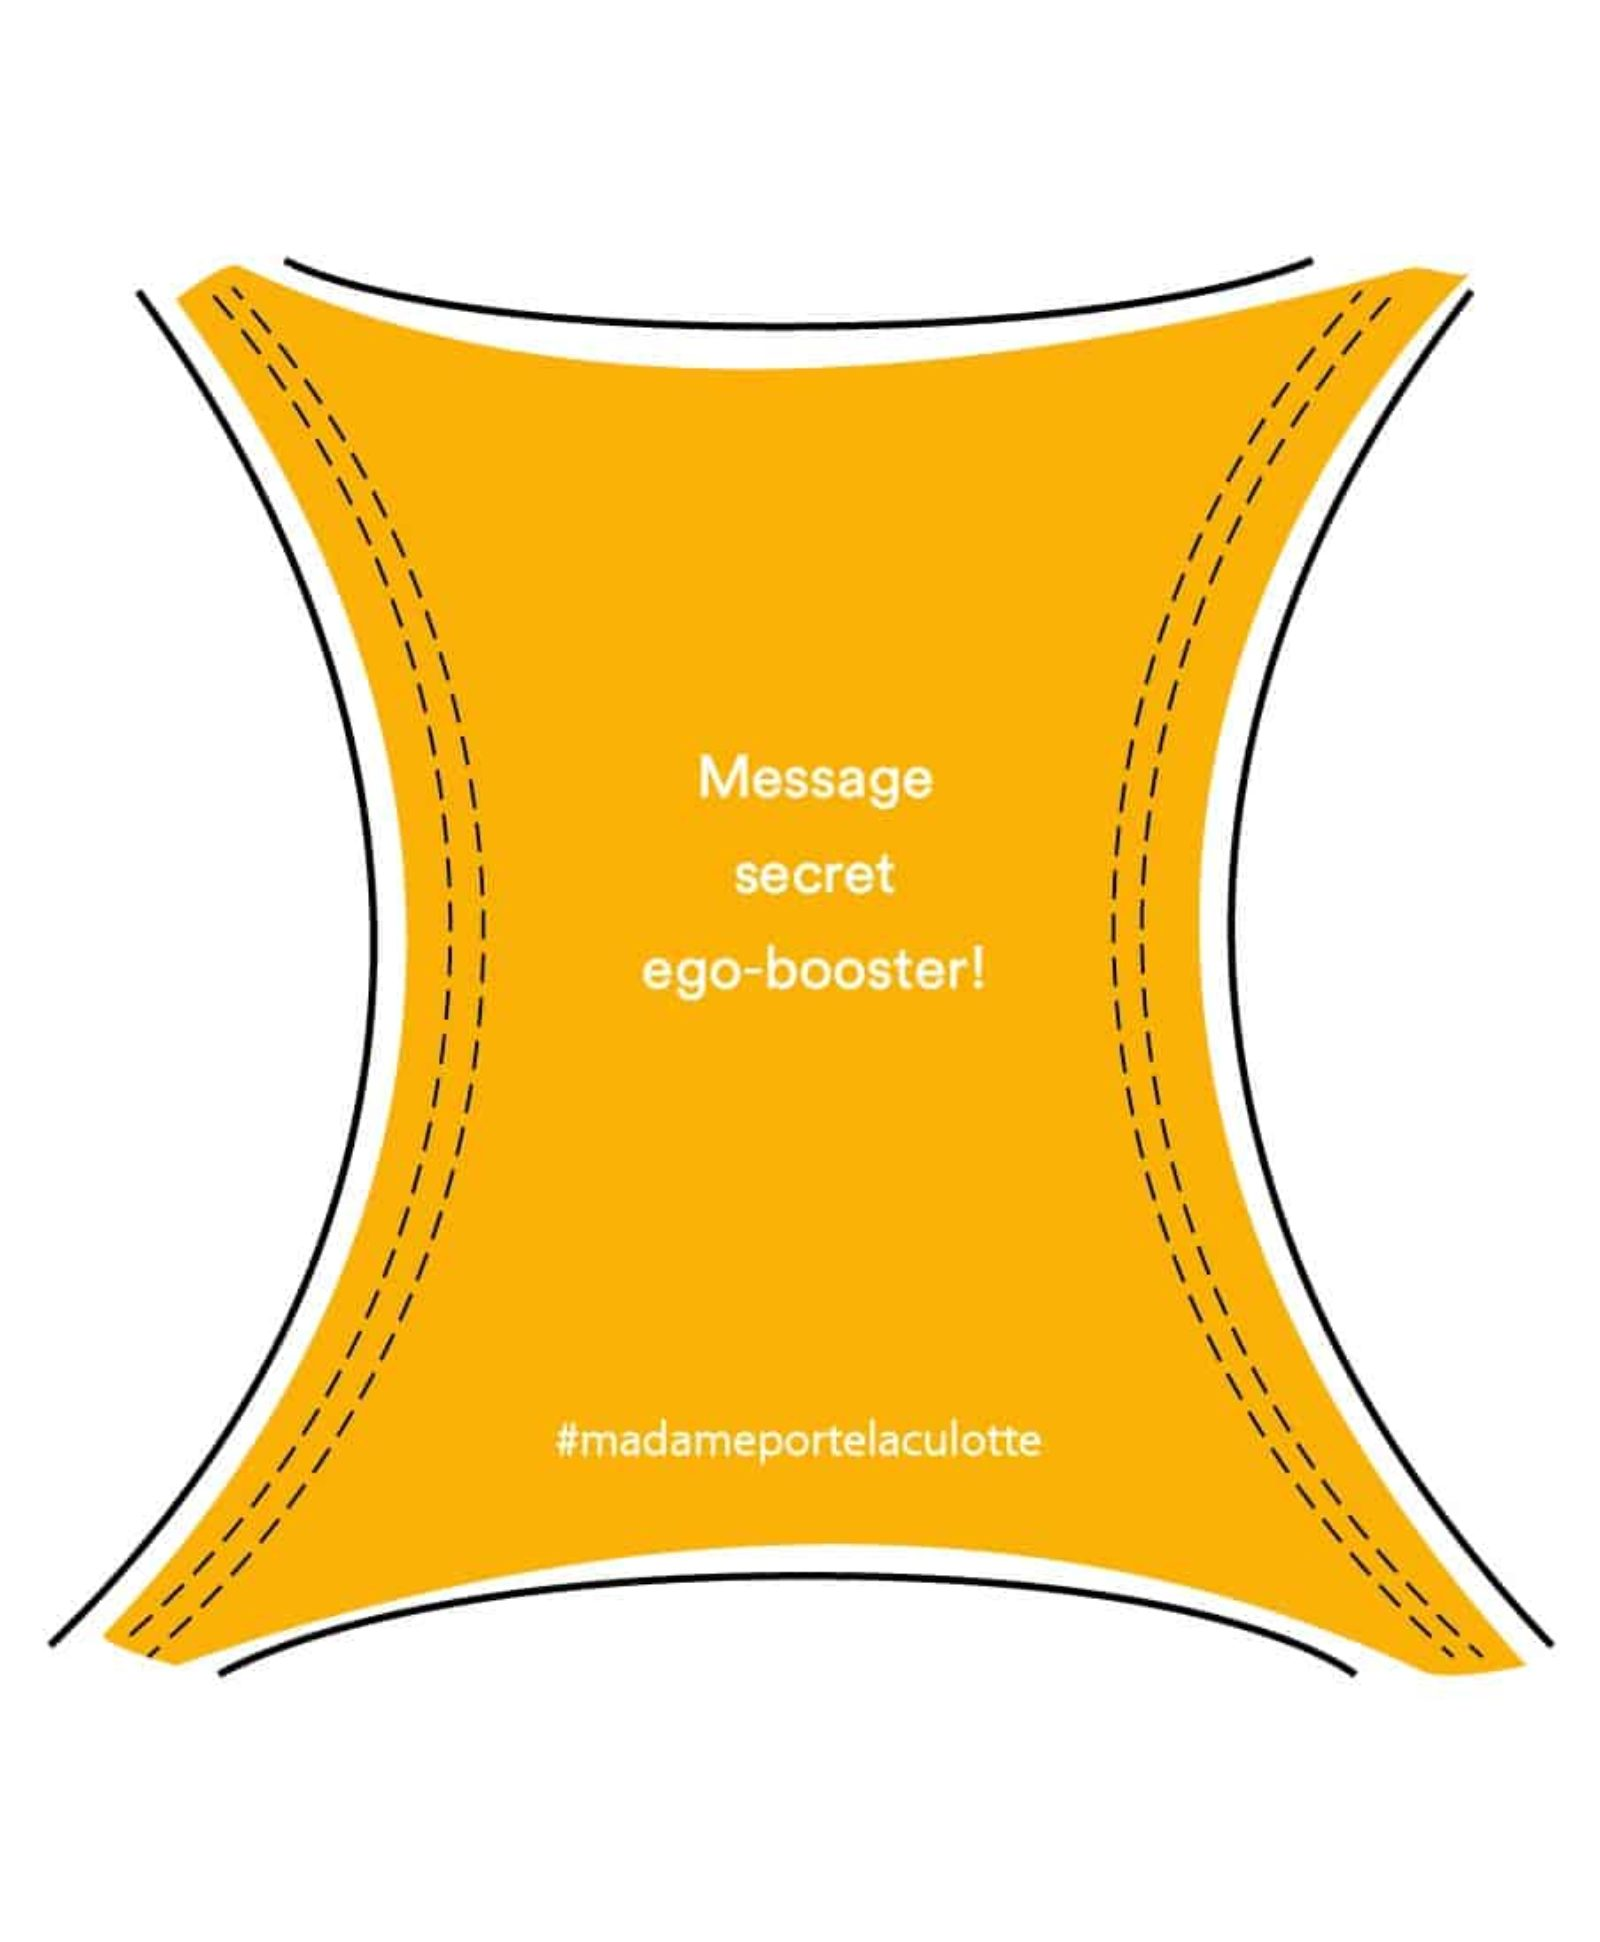 Message ego-booster culotte jaune safran